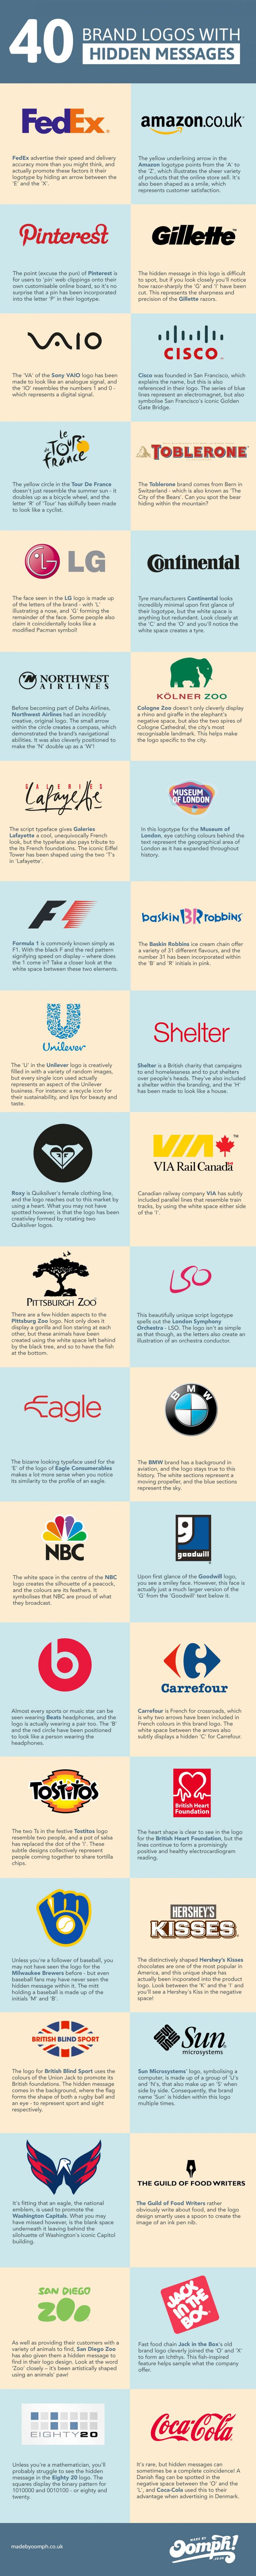 40 Brand #Logos with Hidden Messages